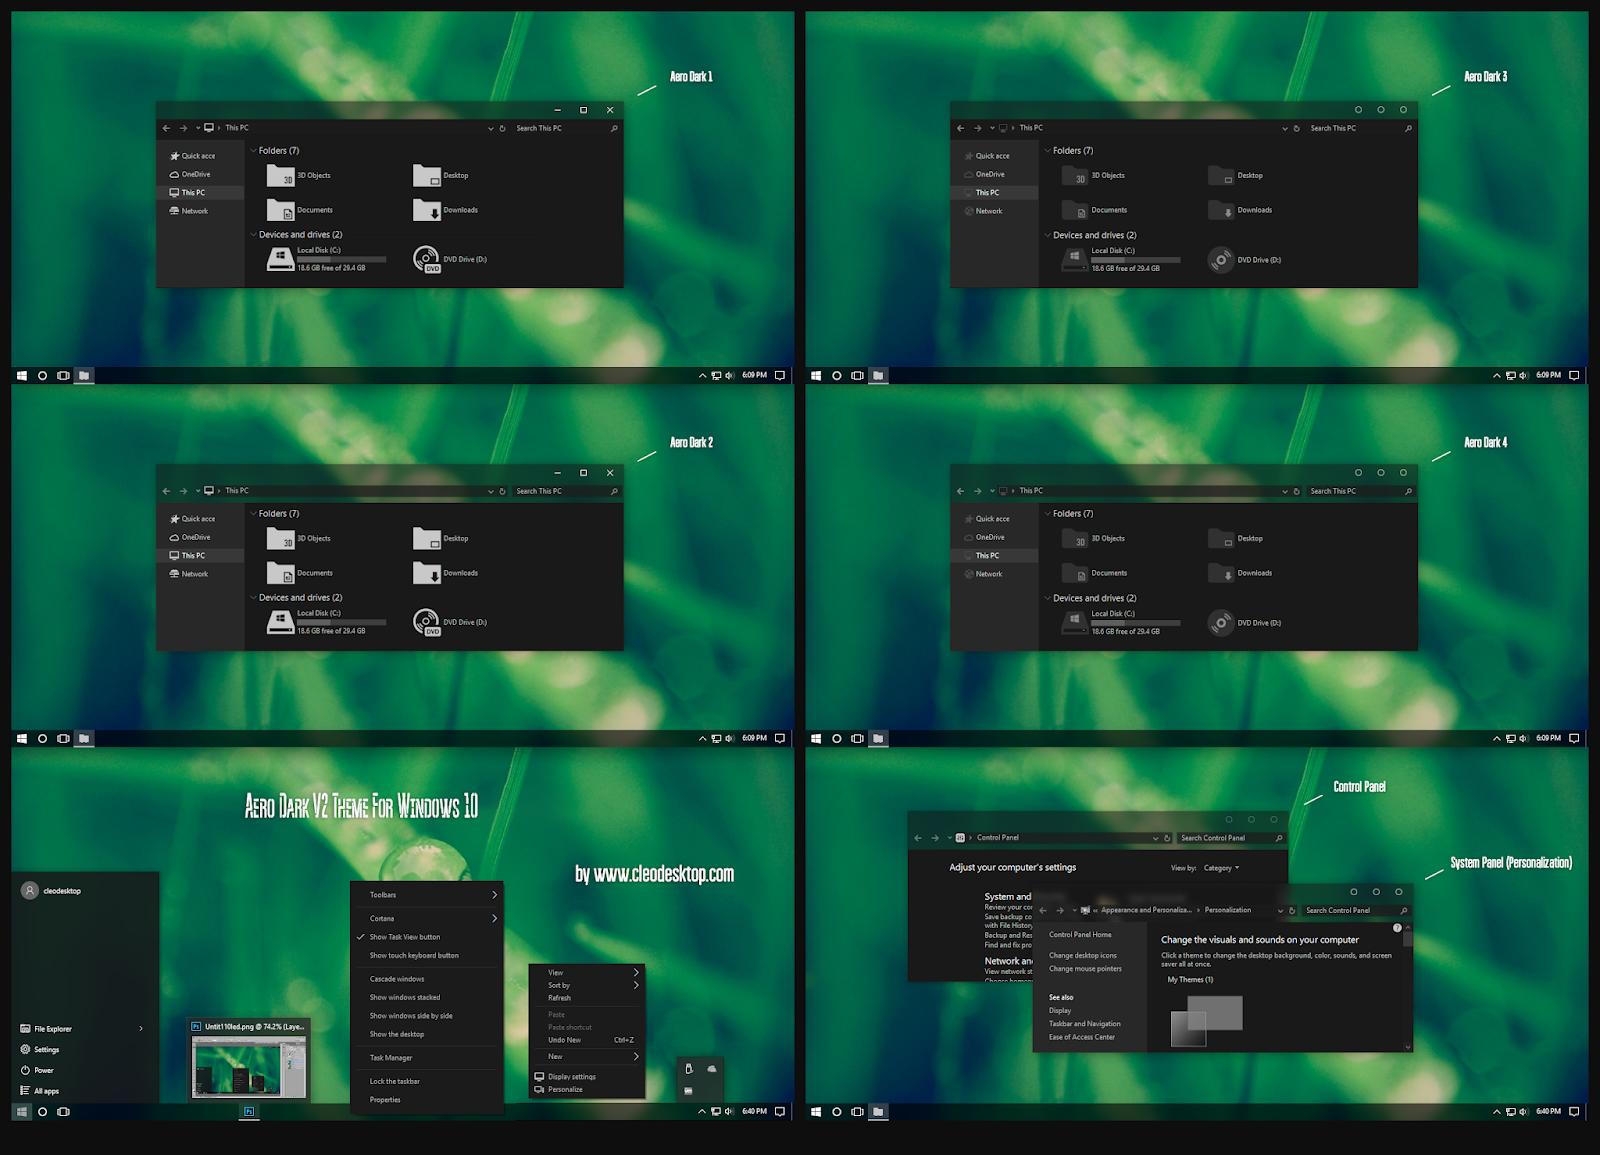 Aero Dark V2 Theme Windows10 November 2019 Update 1909